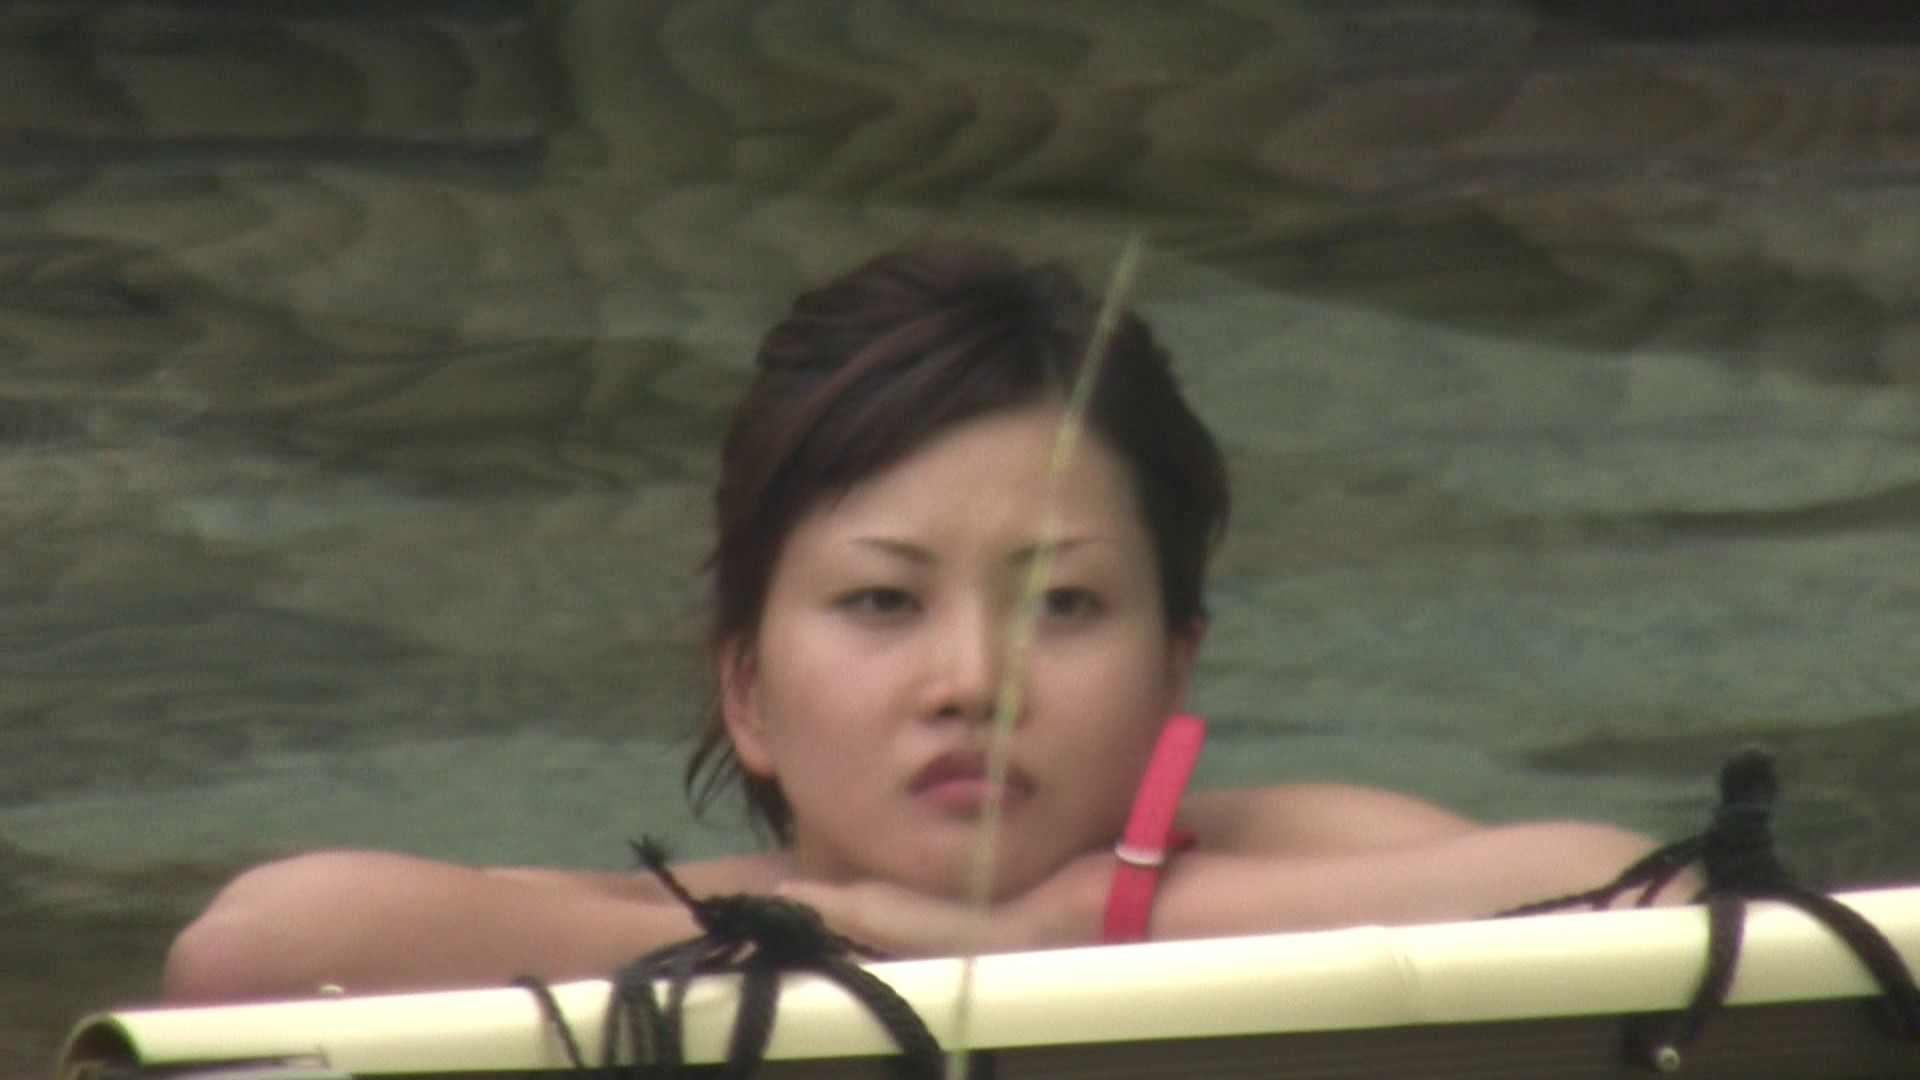 Aquaな露天風呂Vol.125 露天  88連発 1